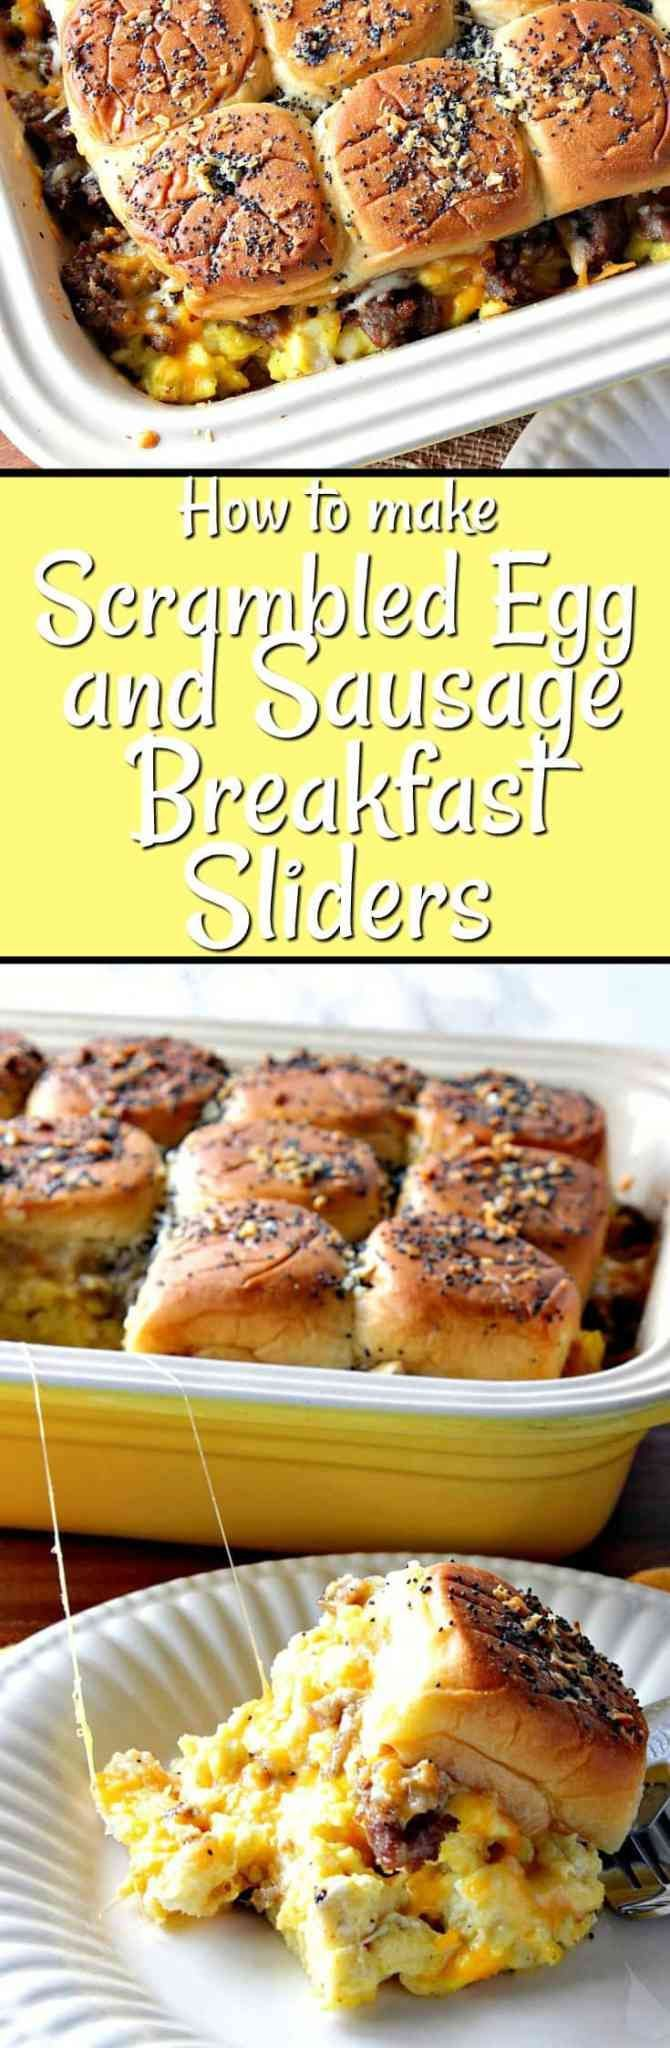 Scrambled Egg & Sausage Breakfast Slider Long Collage Images | Kudos Kitchen by Renee